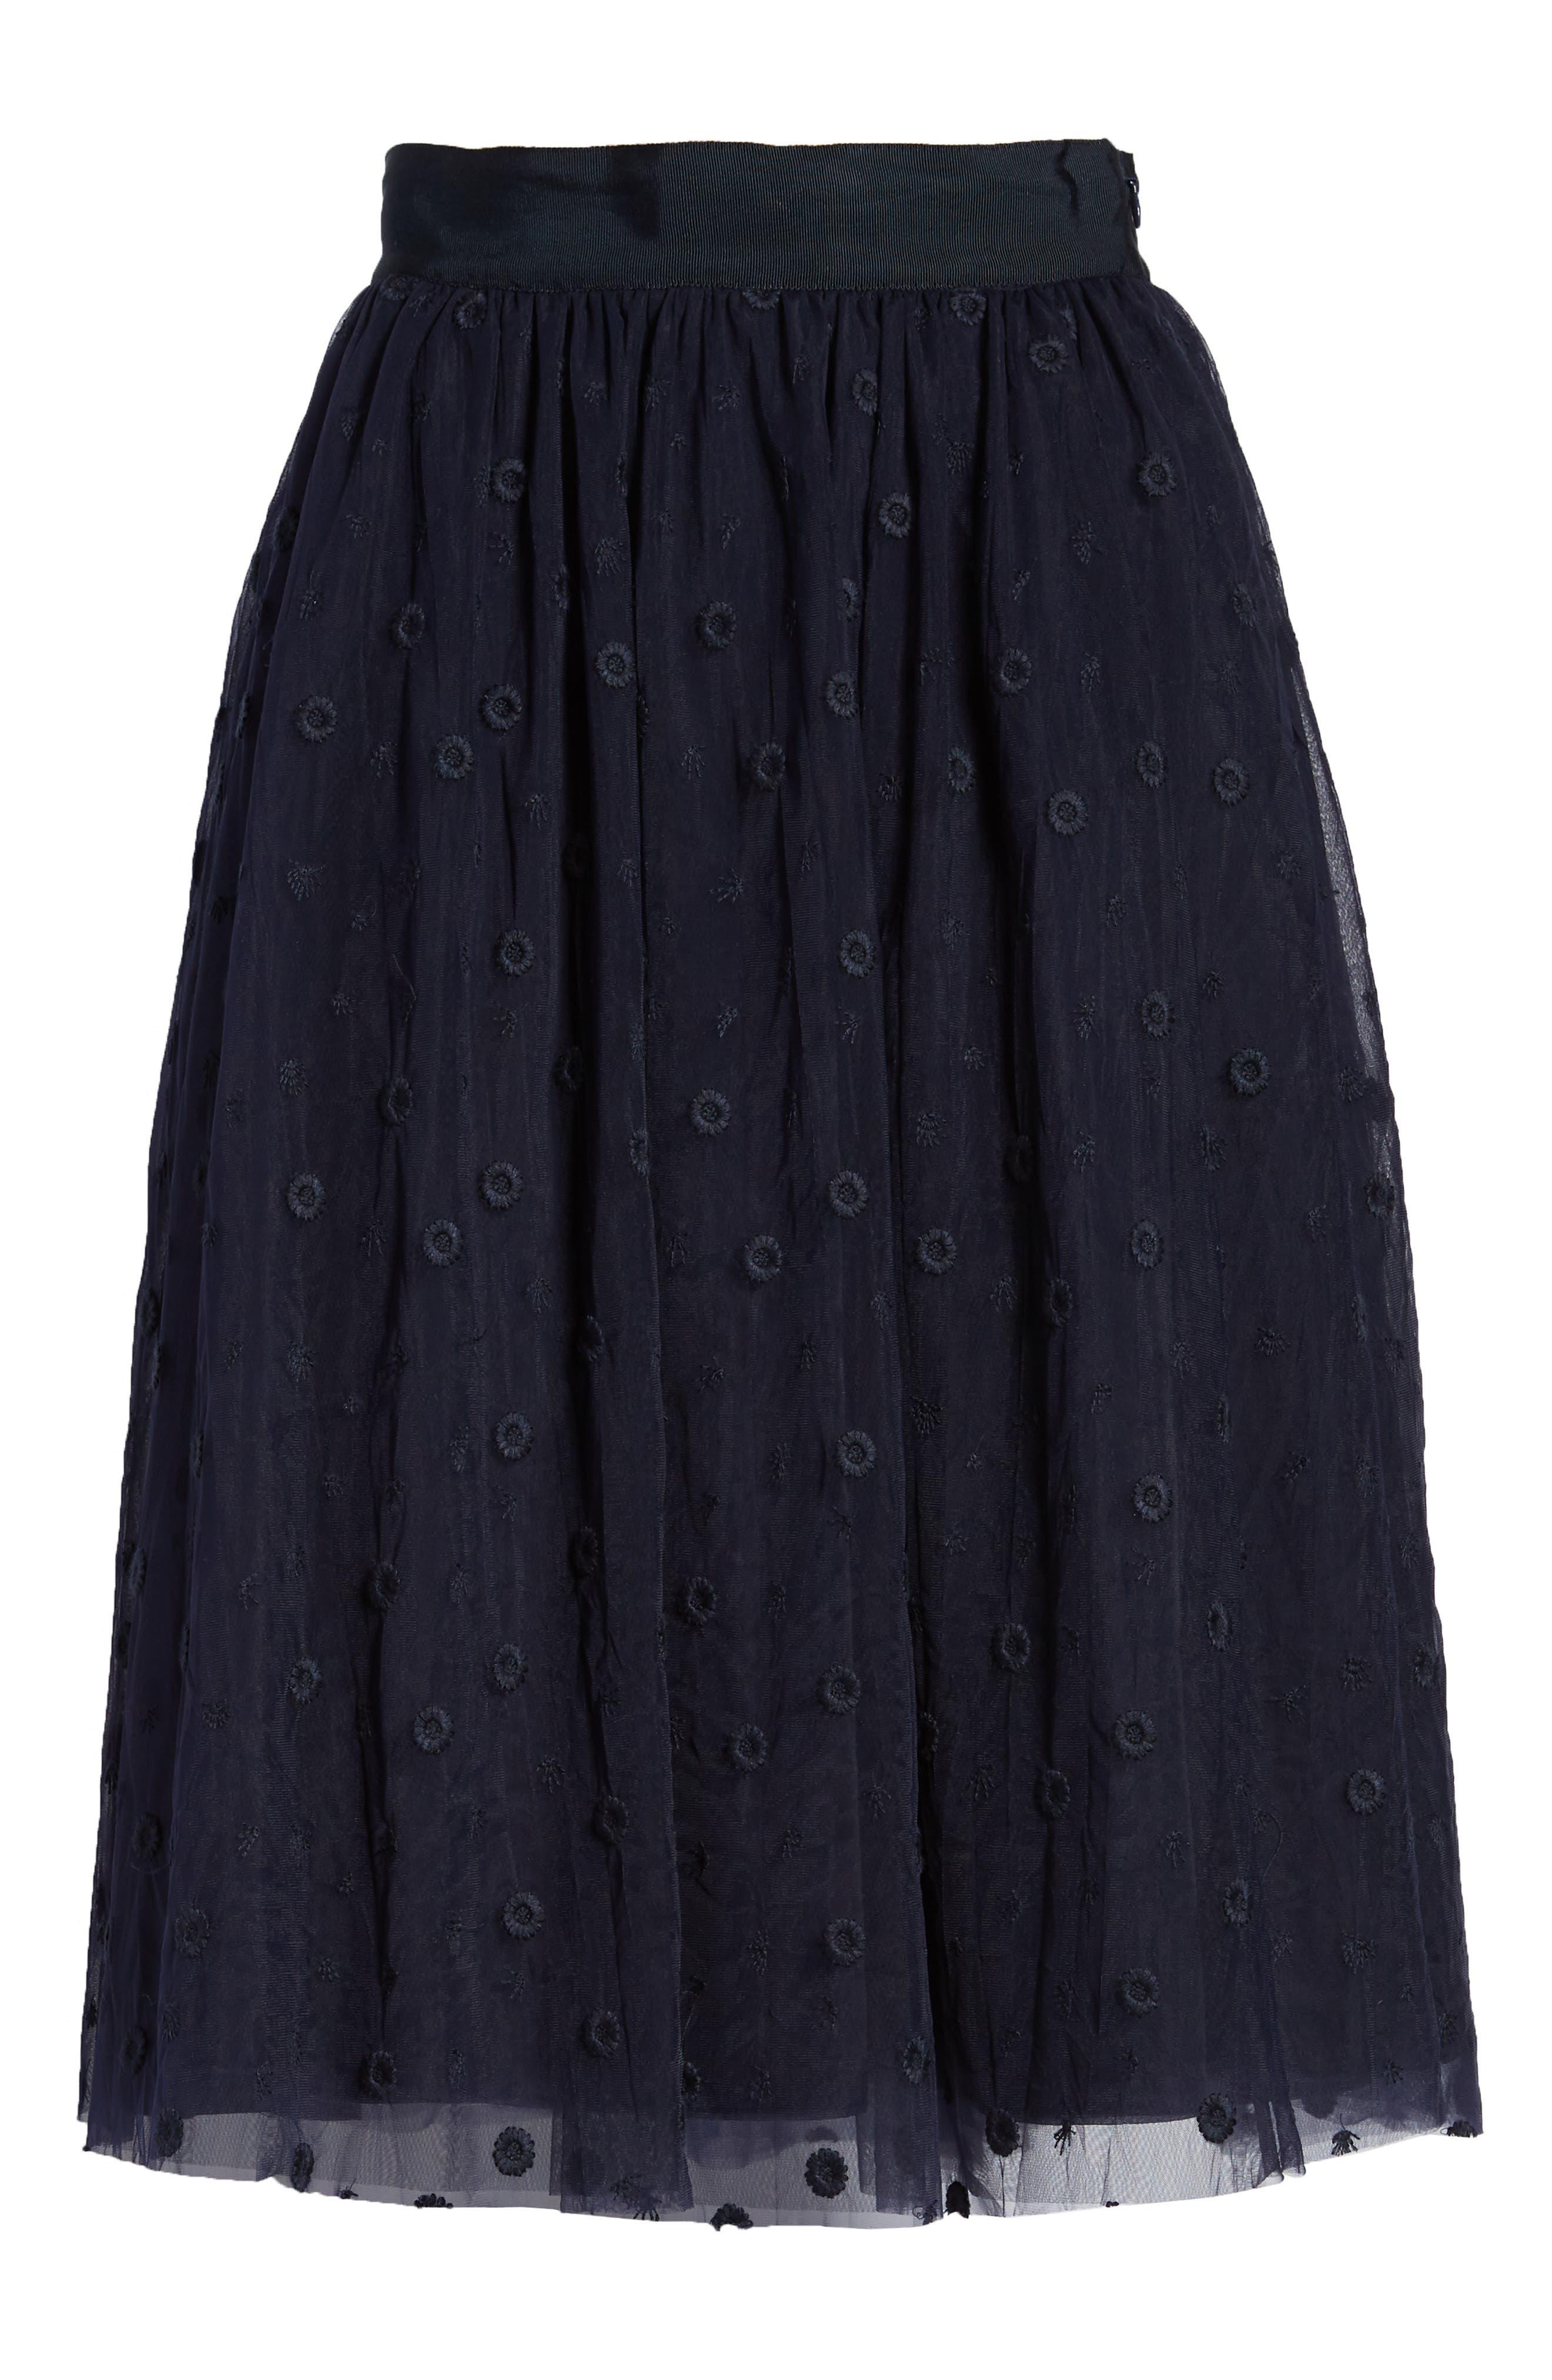 Embroidered Tulle Skirt,                             Alternate thumbnail 6, color,                             410